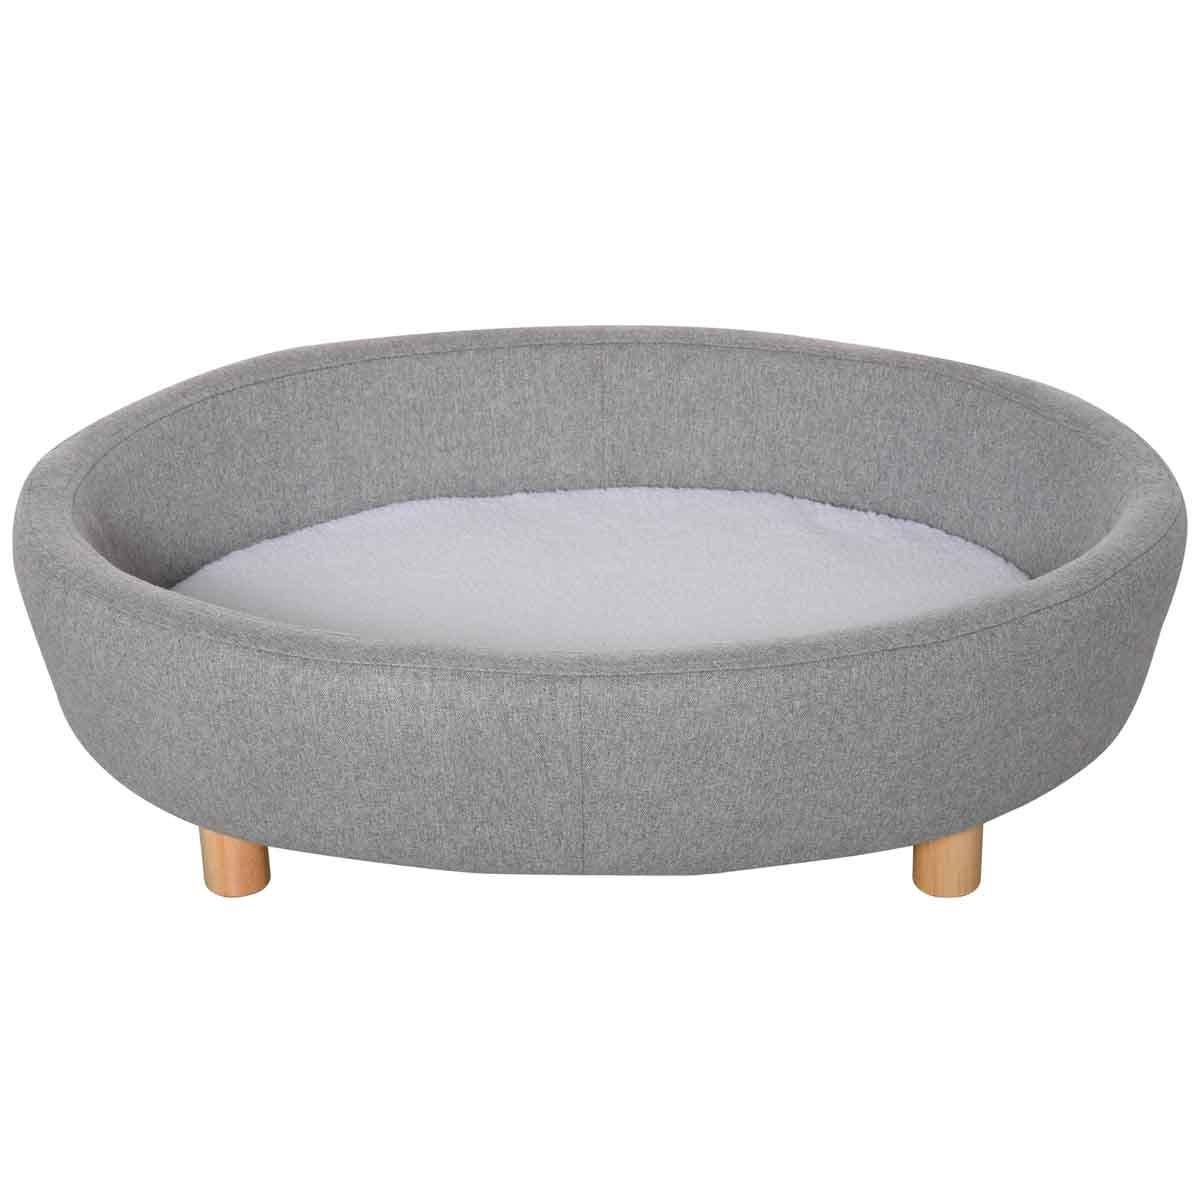 PawHut Soft Sofa Pet W/ Cushioned Bed & Wooden legs - Grey